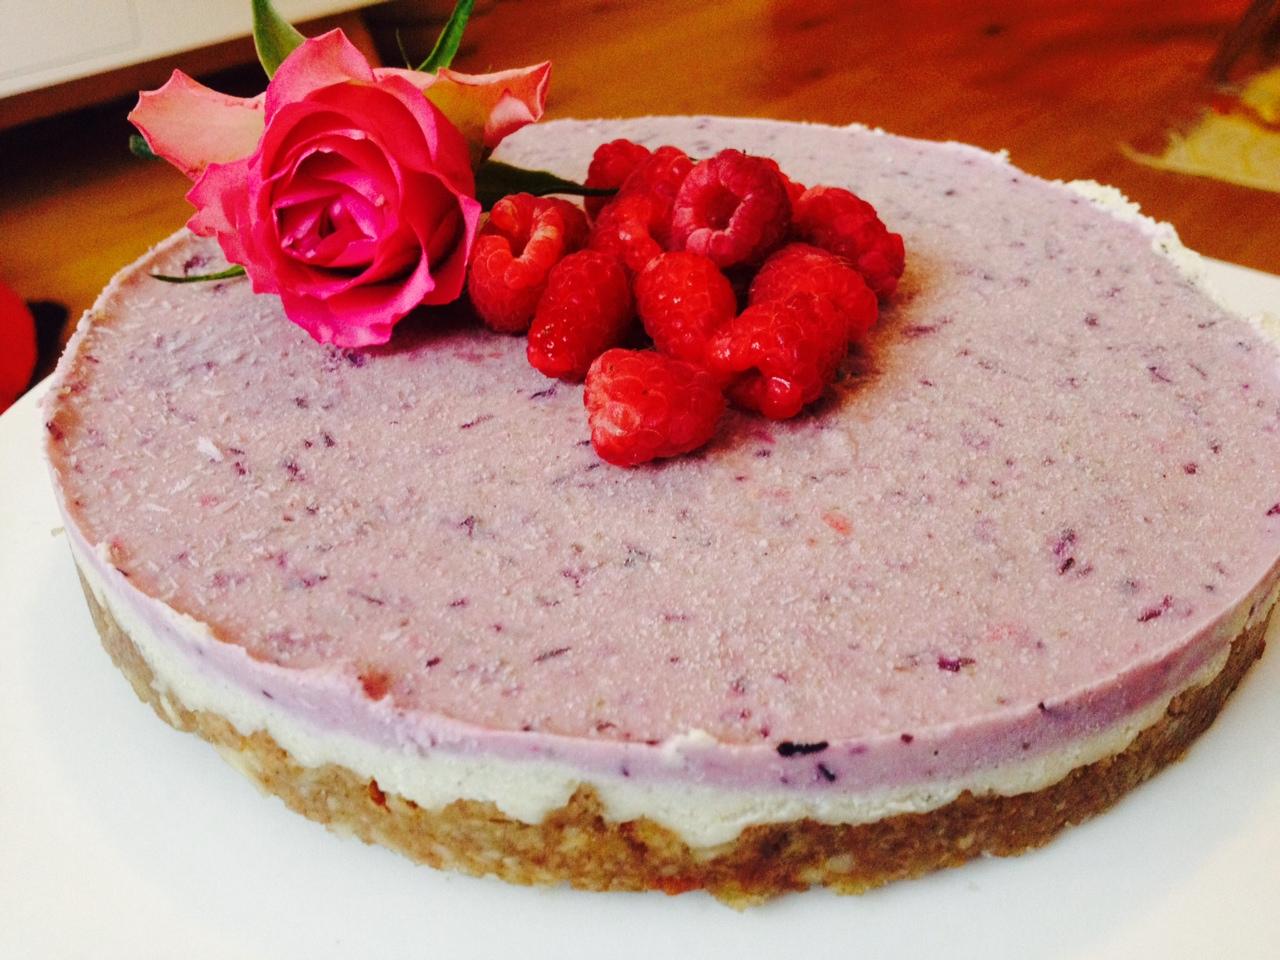 Raw Blueberry & Raspberry Cheesecake